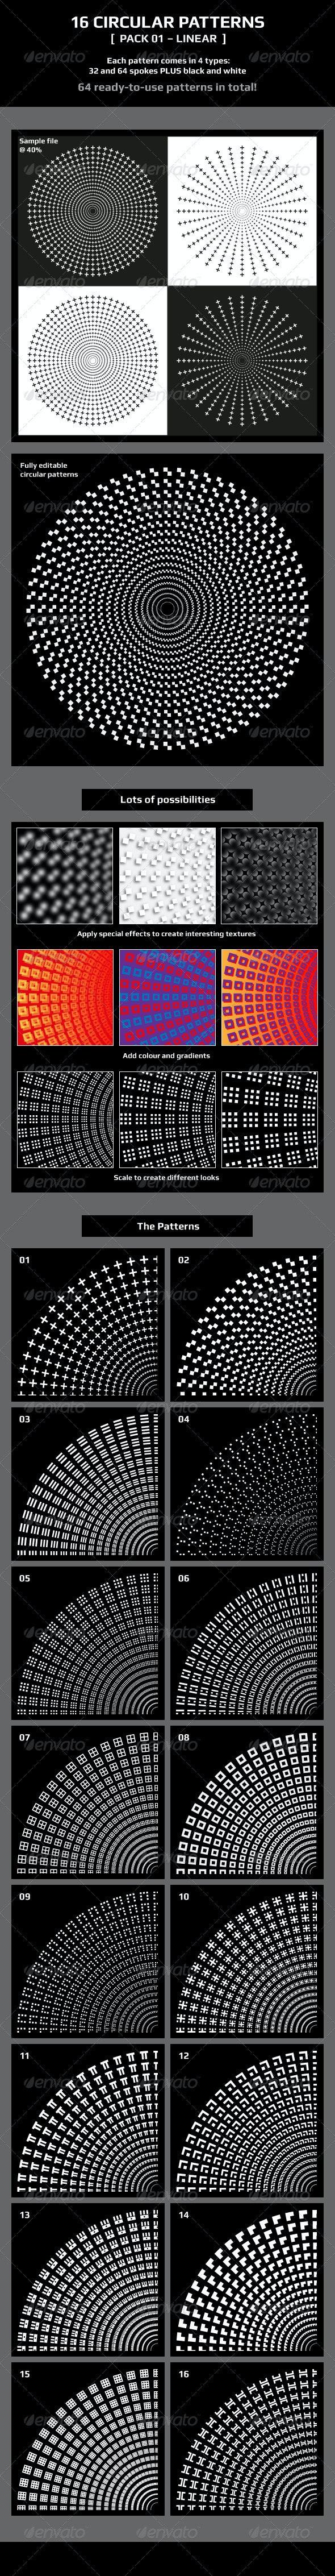 16 Circular Patterns - [Pack 01 - Linear] - Patterns Decorative